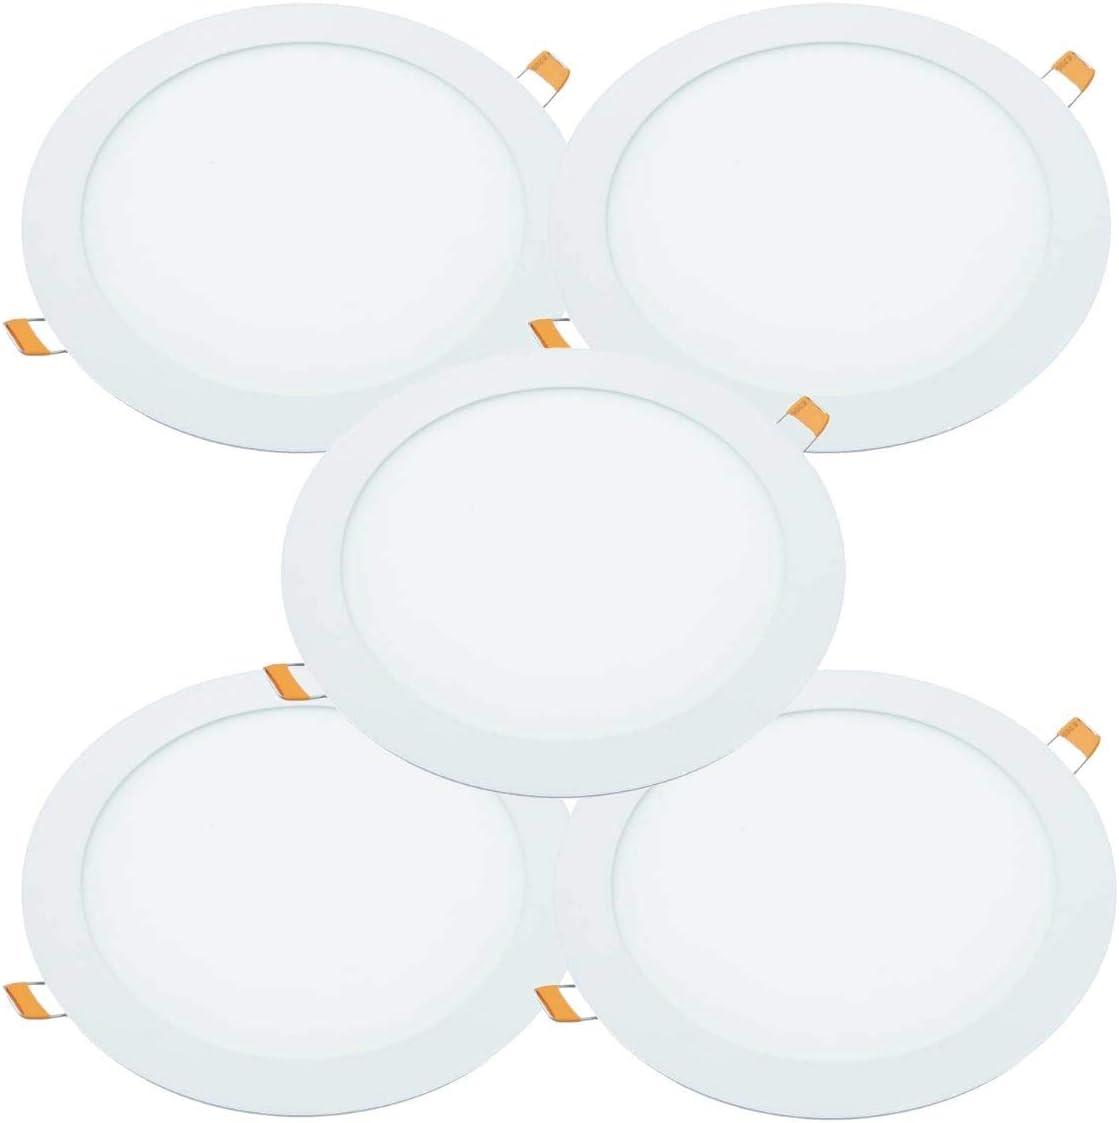 JANDEI - 5x Downlight LED 18W Redondo Plano De Empotrar, Aluminio Aro Blanco Mate, Para Hueco De 200-205mm Blanco [Clase de eficiencia energética A+] ...